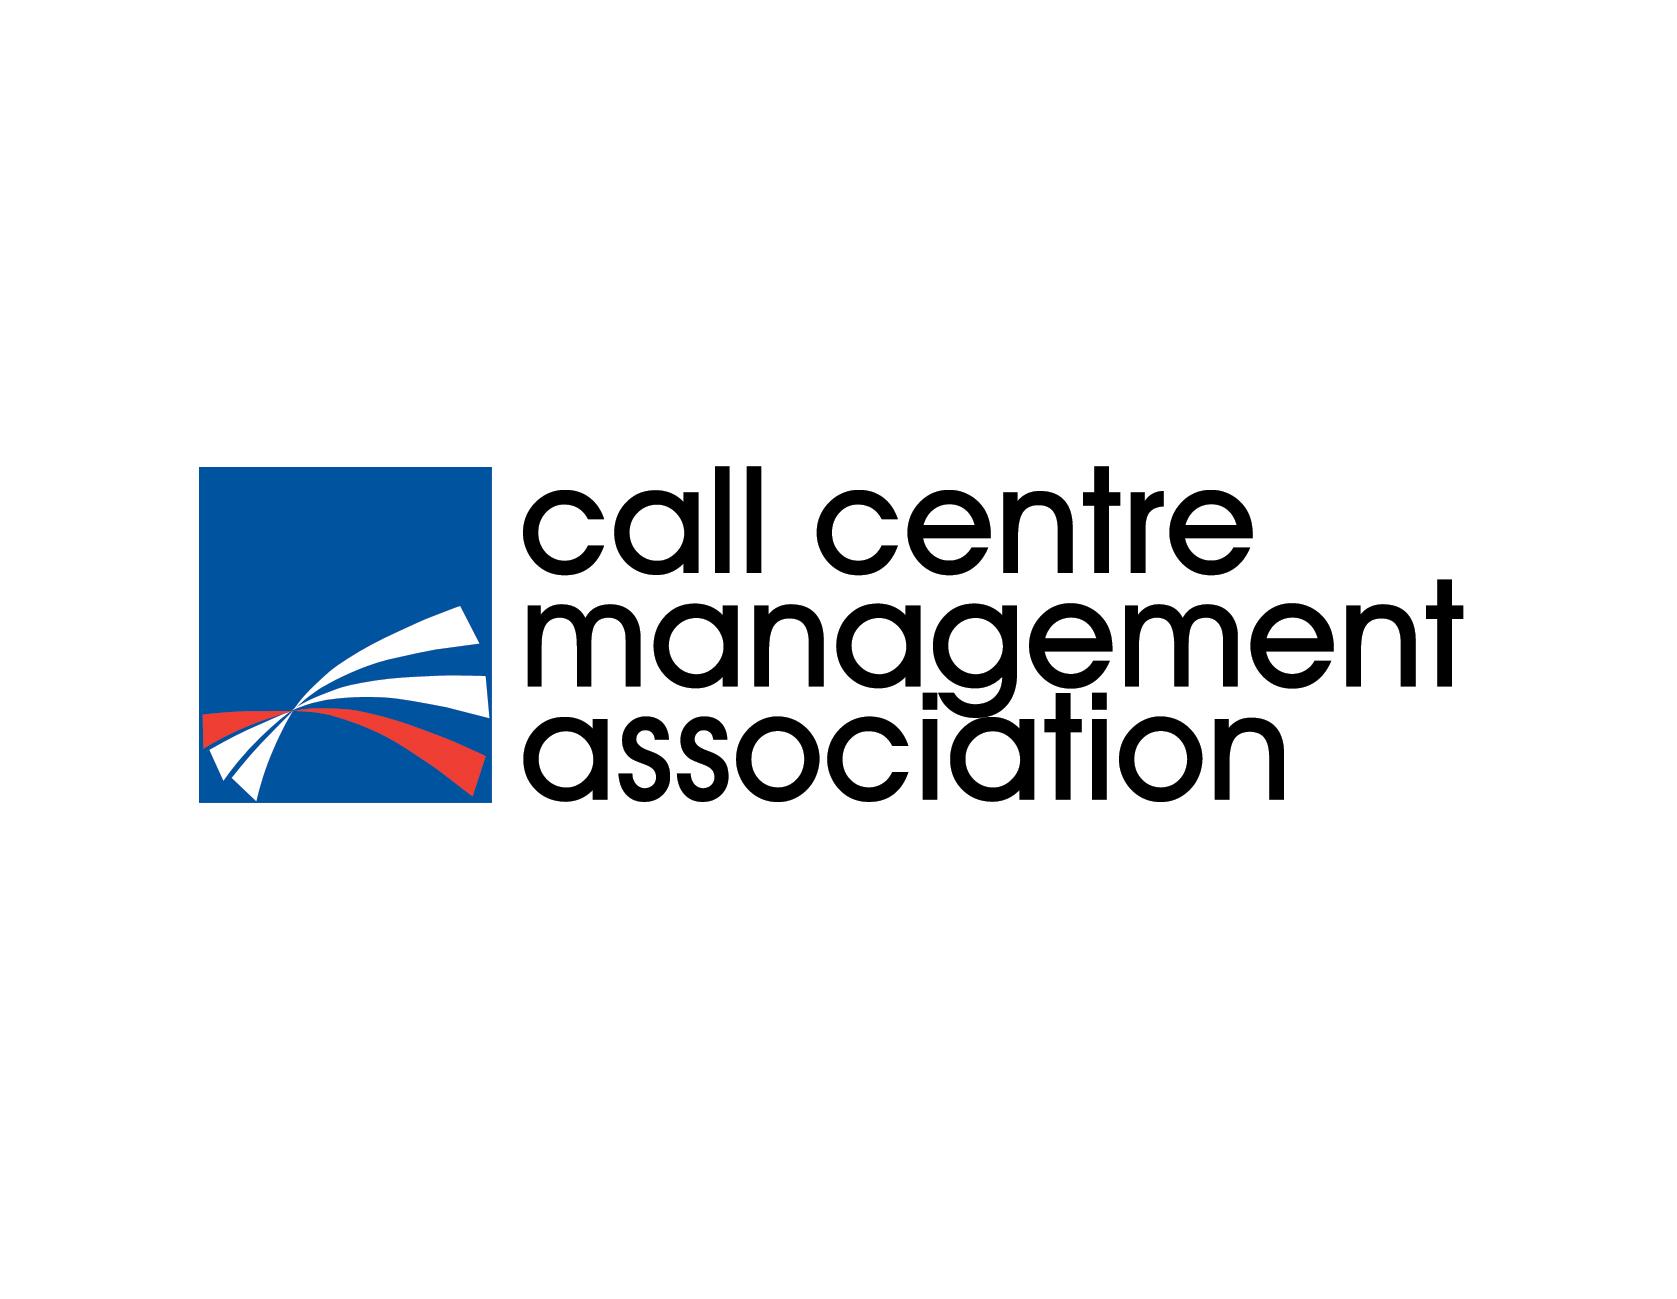 Customer Contact Management Association (CCMA)